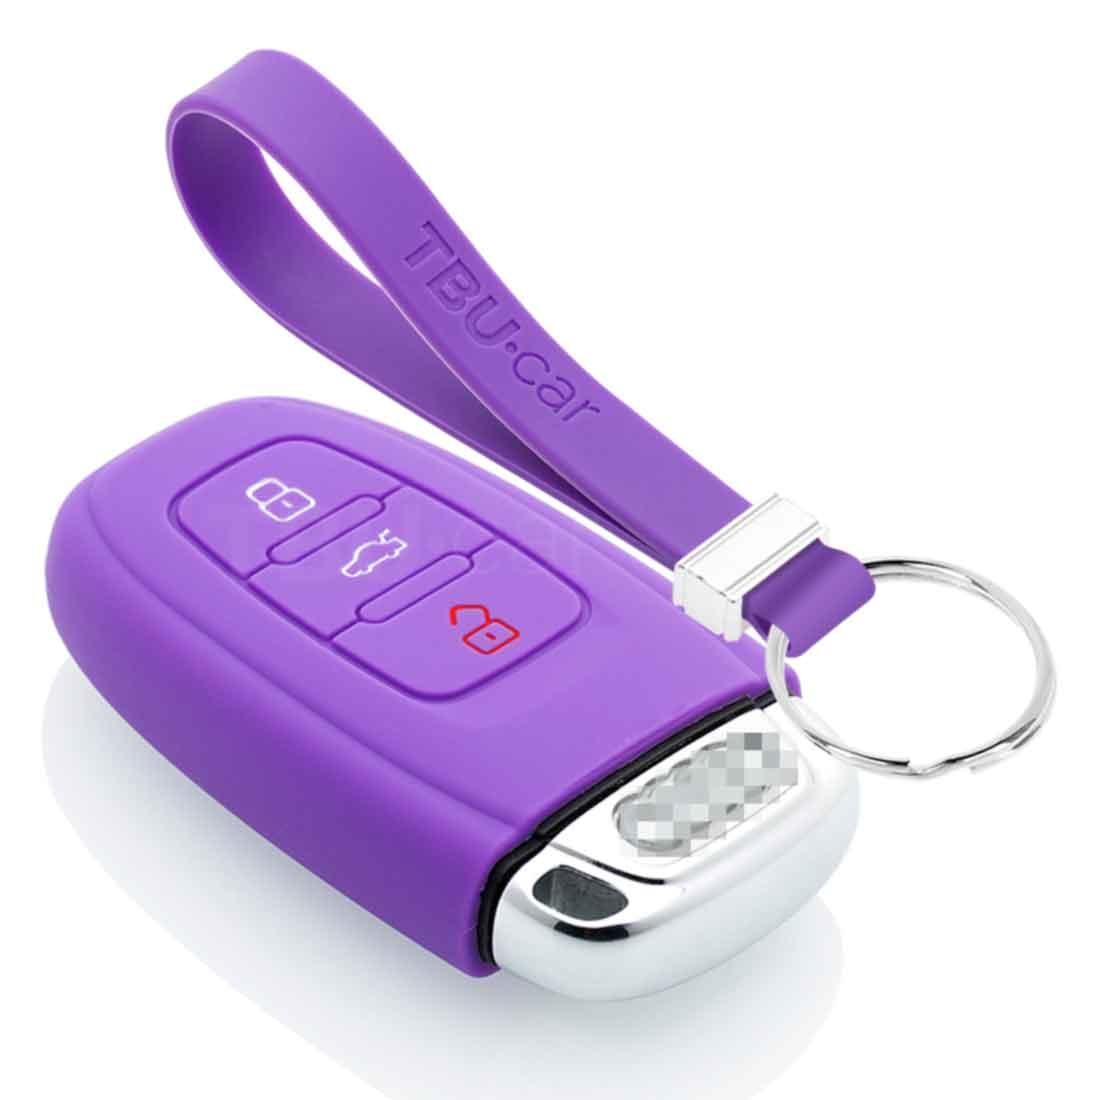 TBU car TBU car Autoschlüssel Hülle kompatibel mit Audi 3 Tasten (Keyless Entry) - Schutzhülle aus Silikon - Auto Schlüsselhülle Cover in Violett